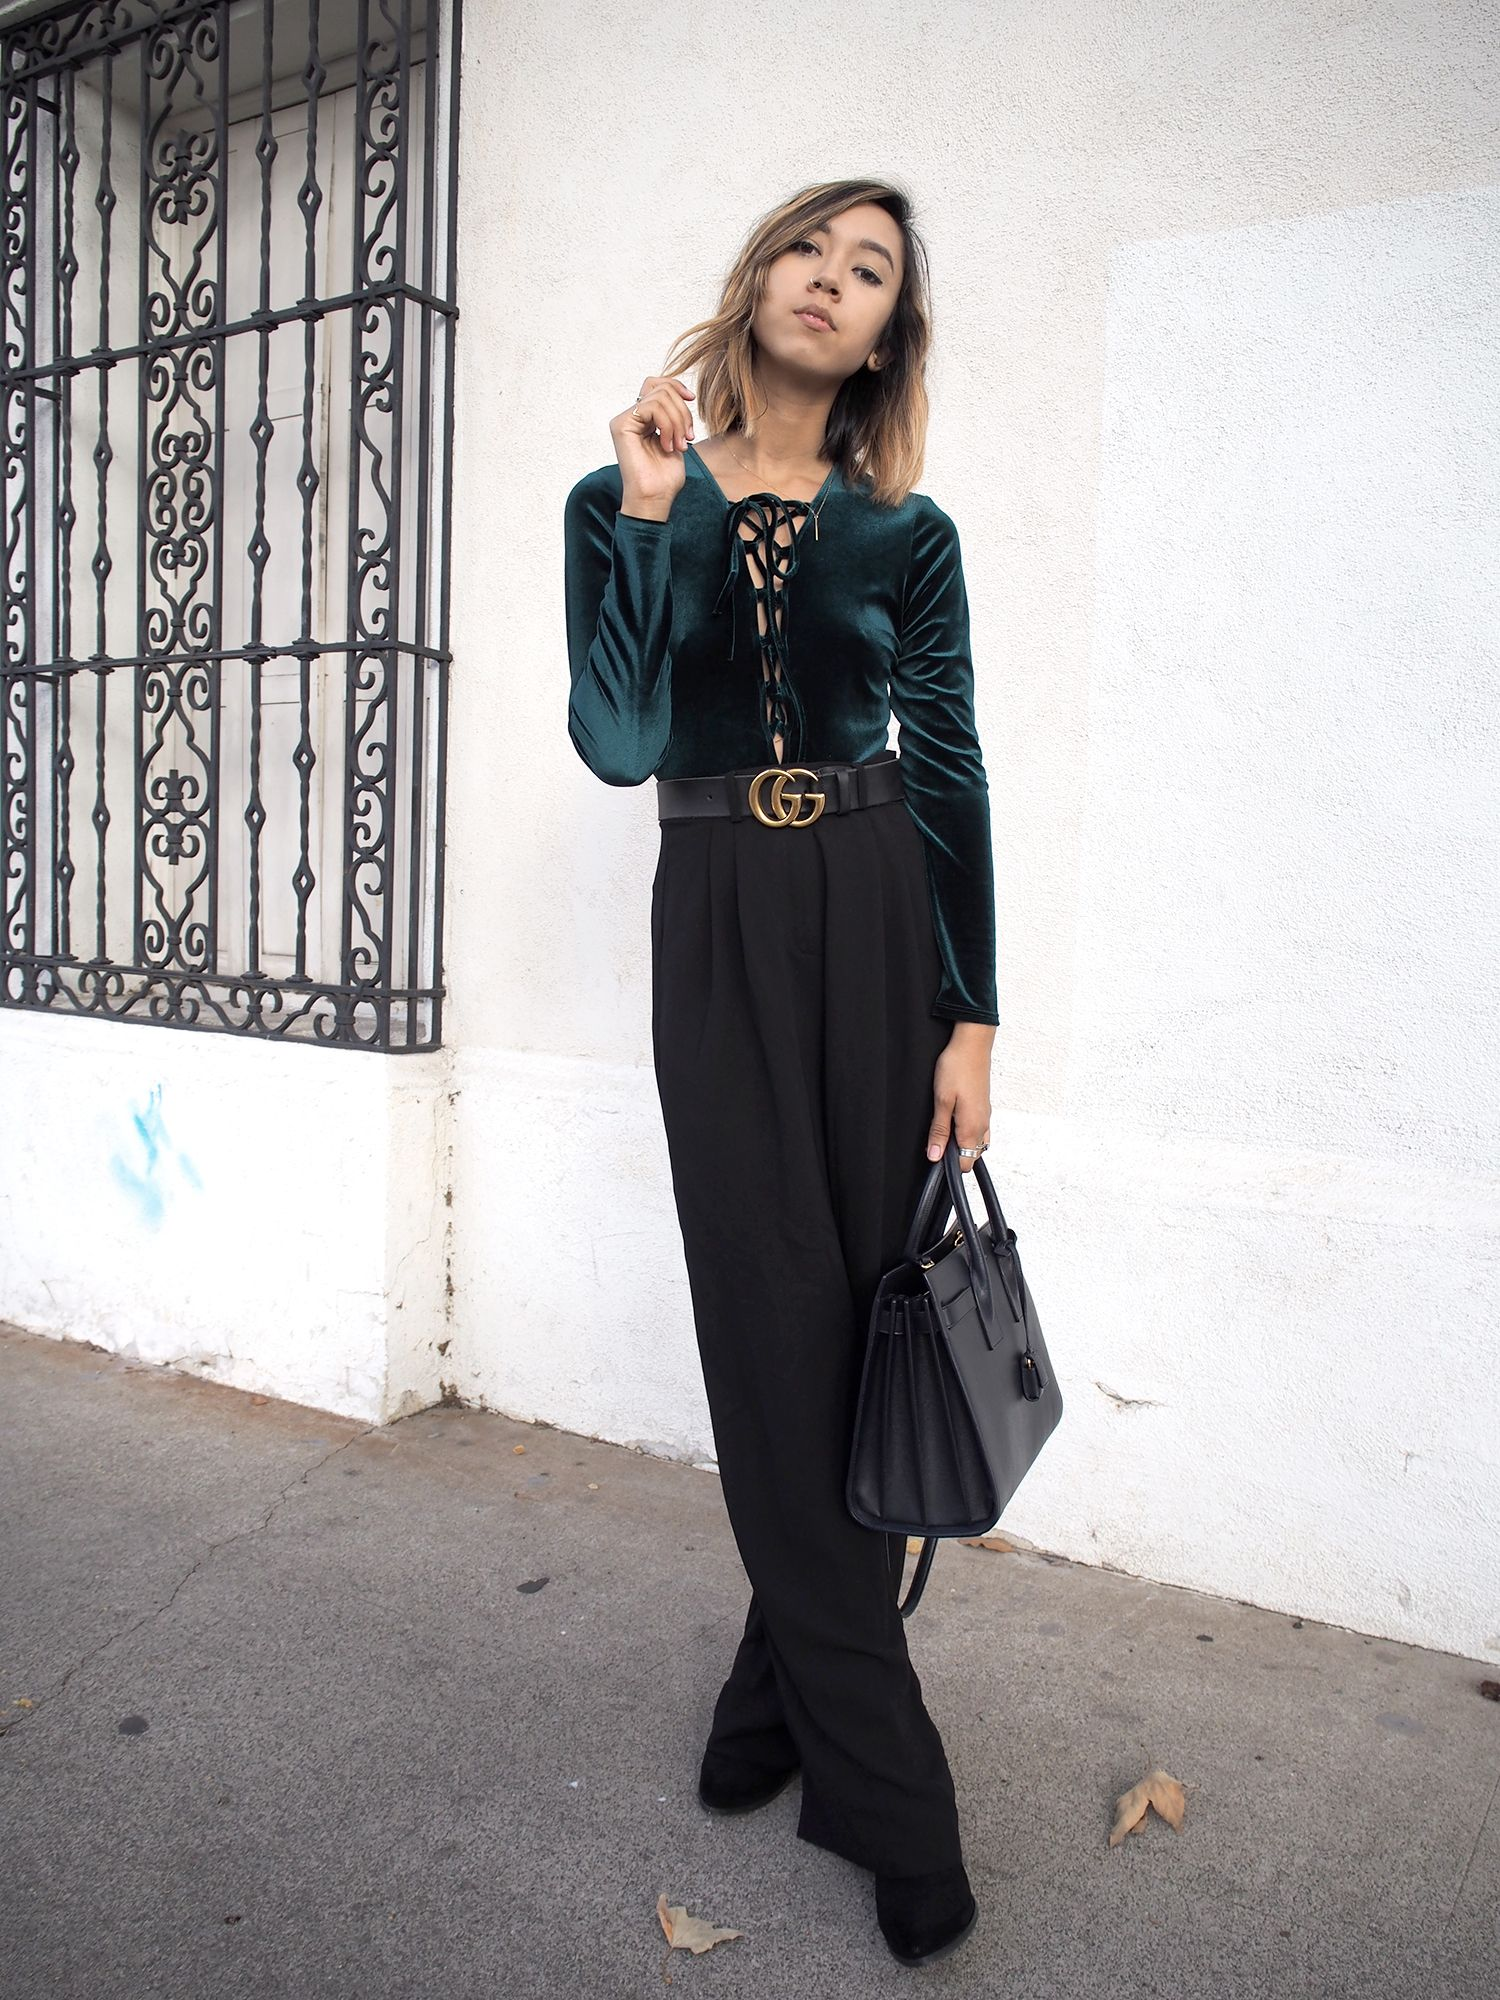 639aa9bfa3 Velvet Lace Up Body Suit Street Style